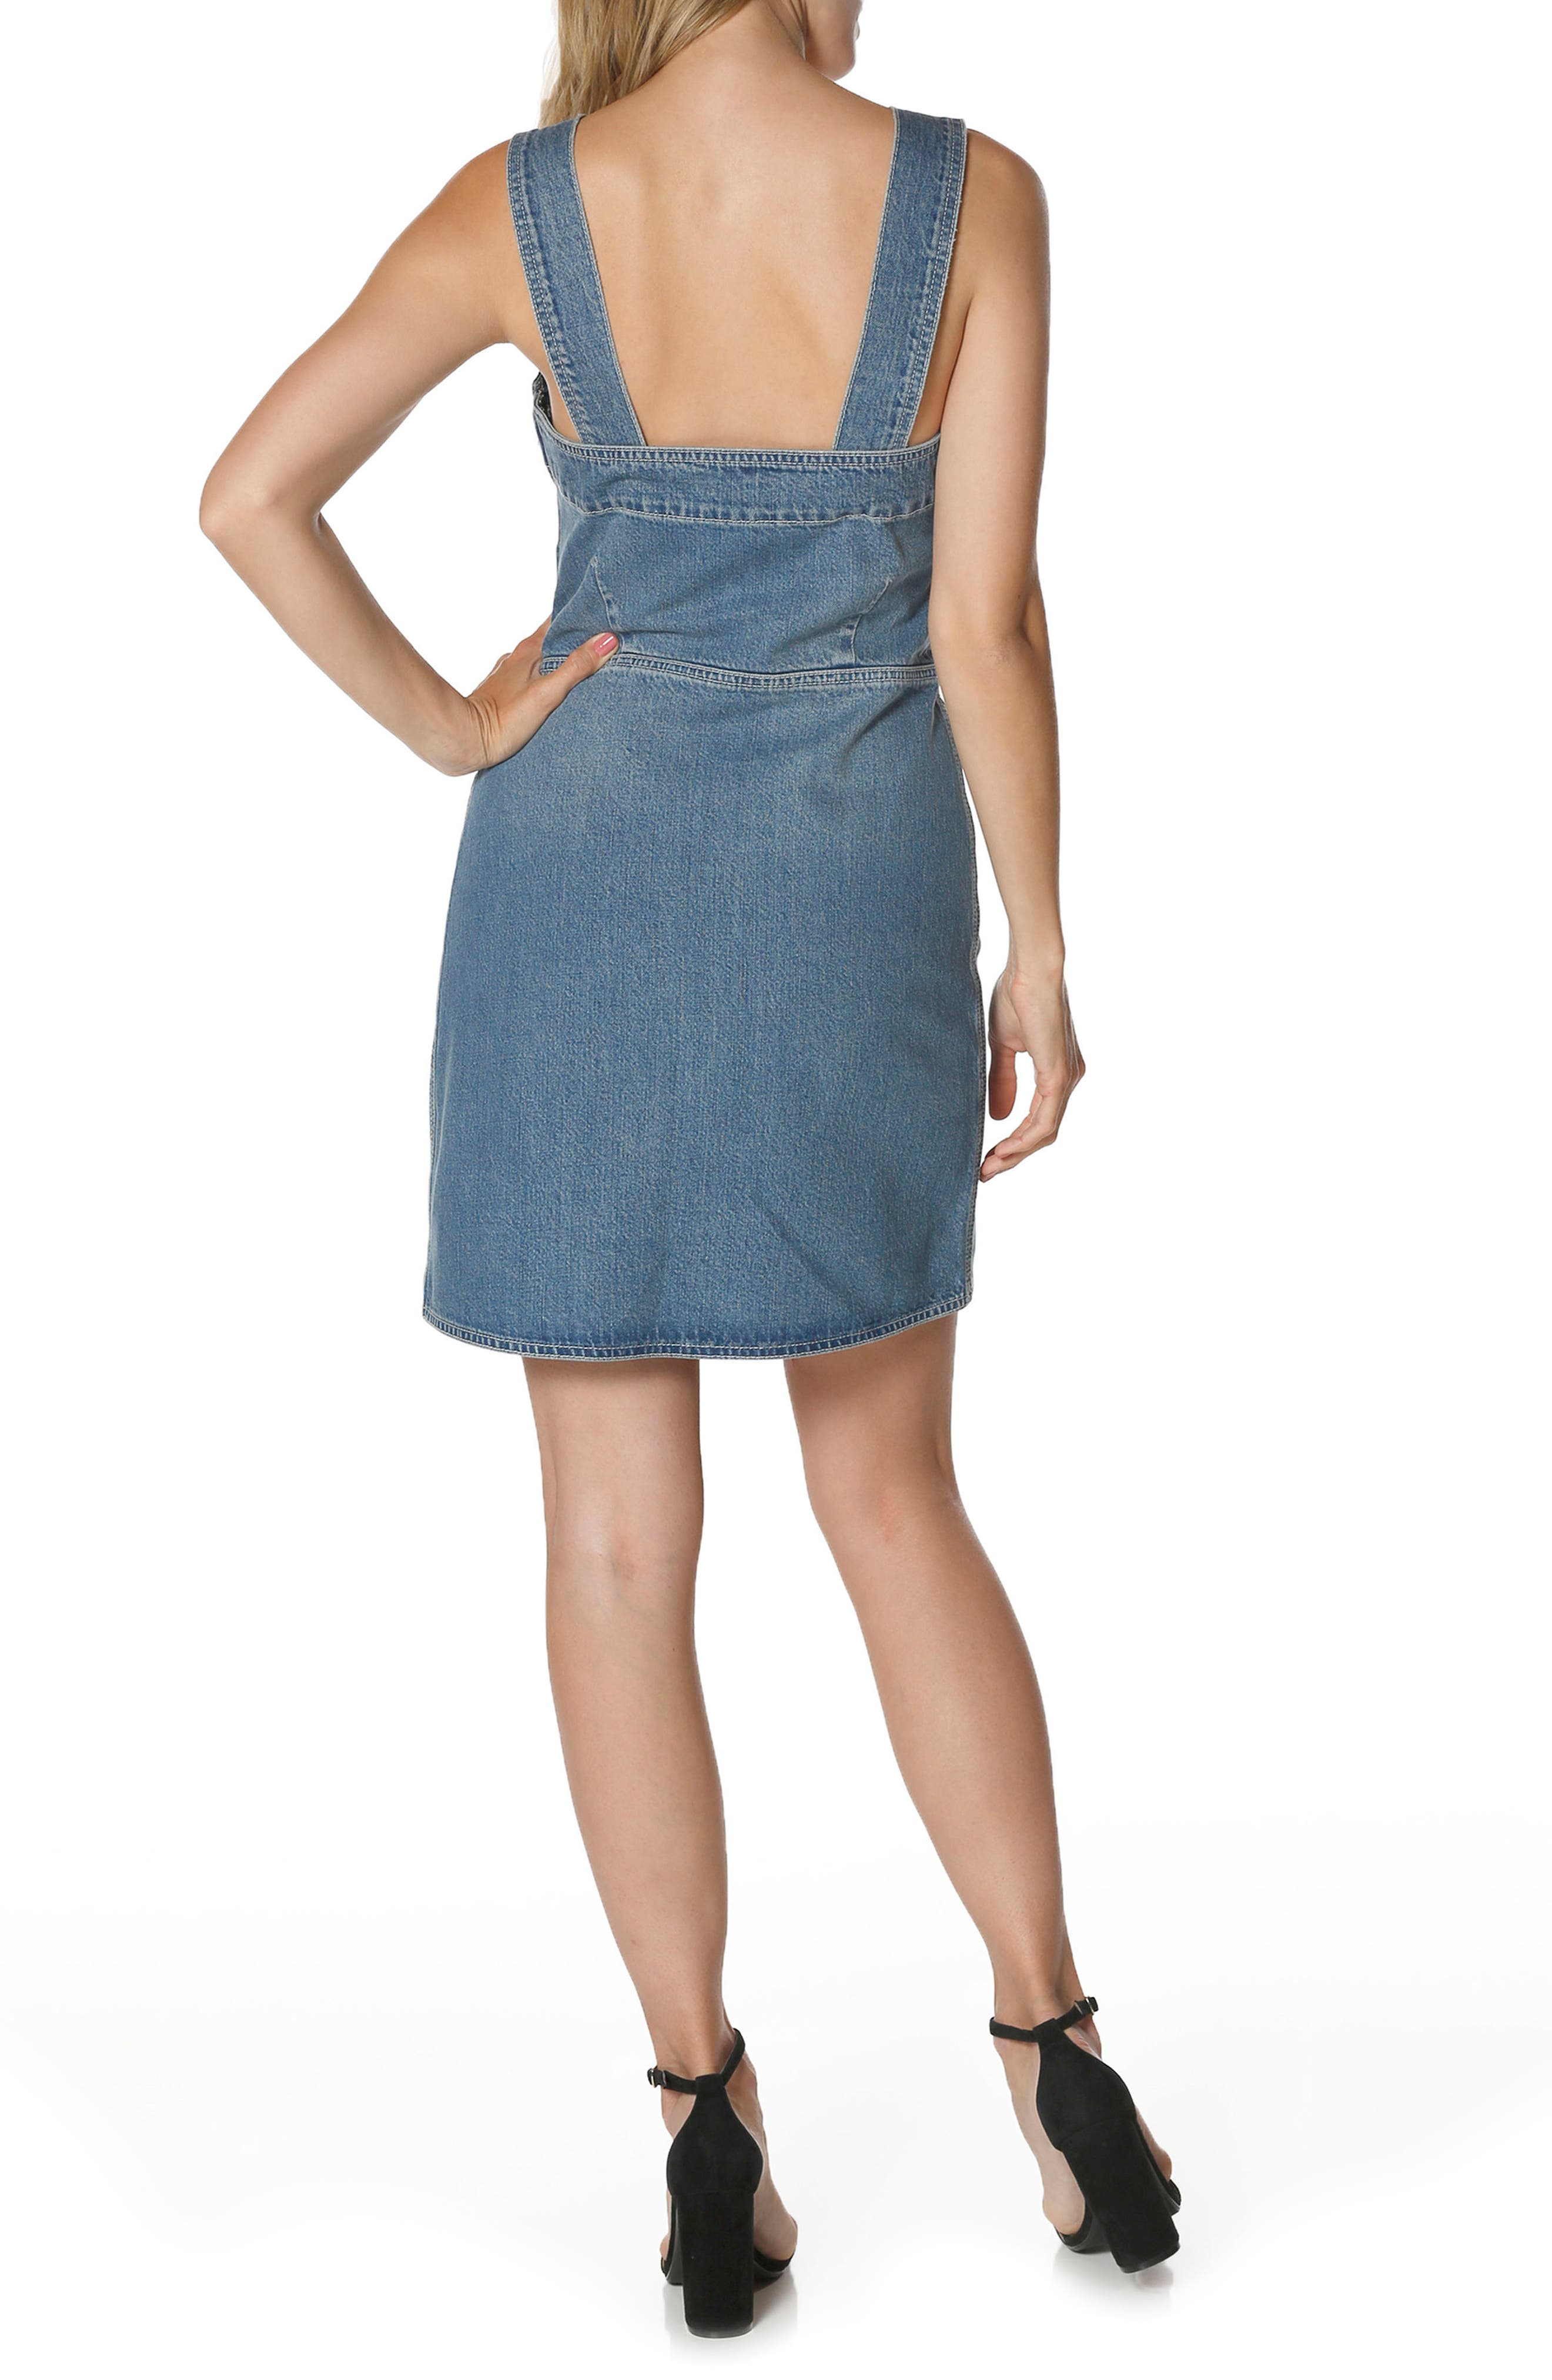 Tula Lace-Up Denim Dress,                             Alternate thumbnail 2, color,                             400